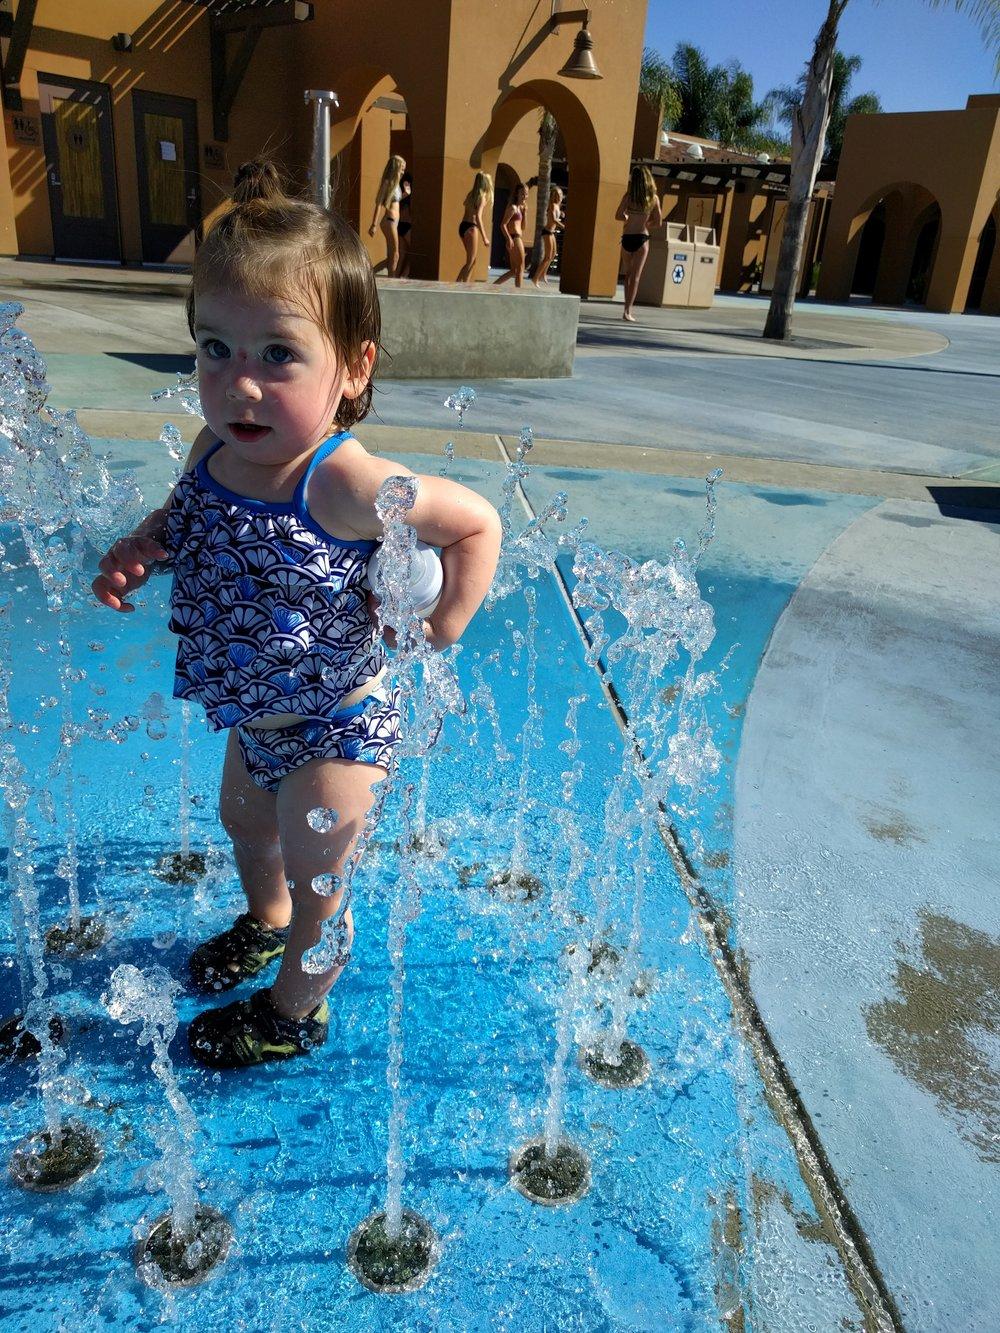 Splash pad!